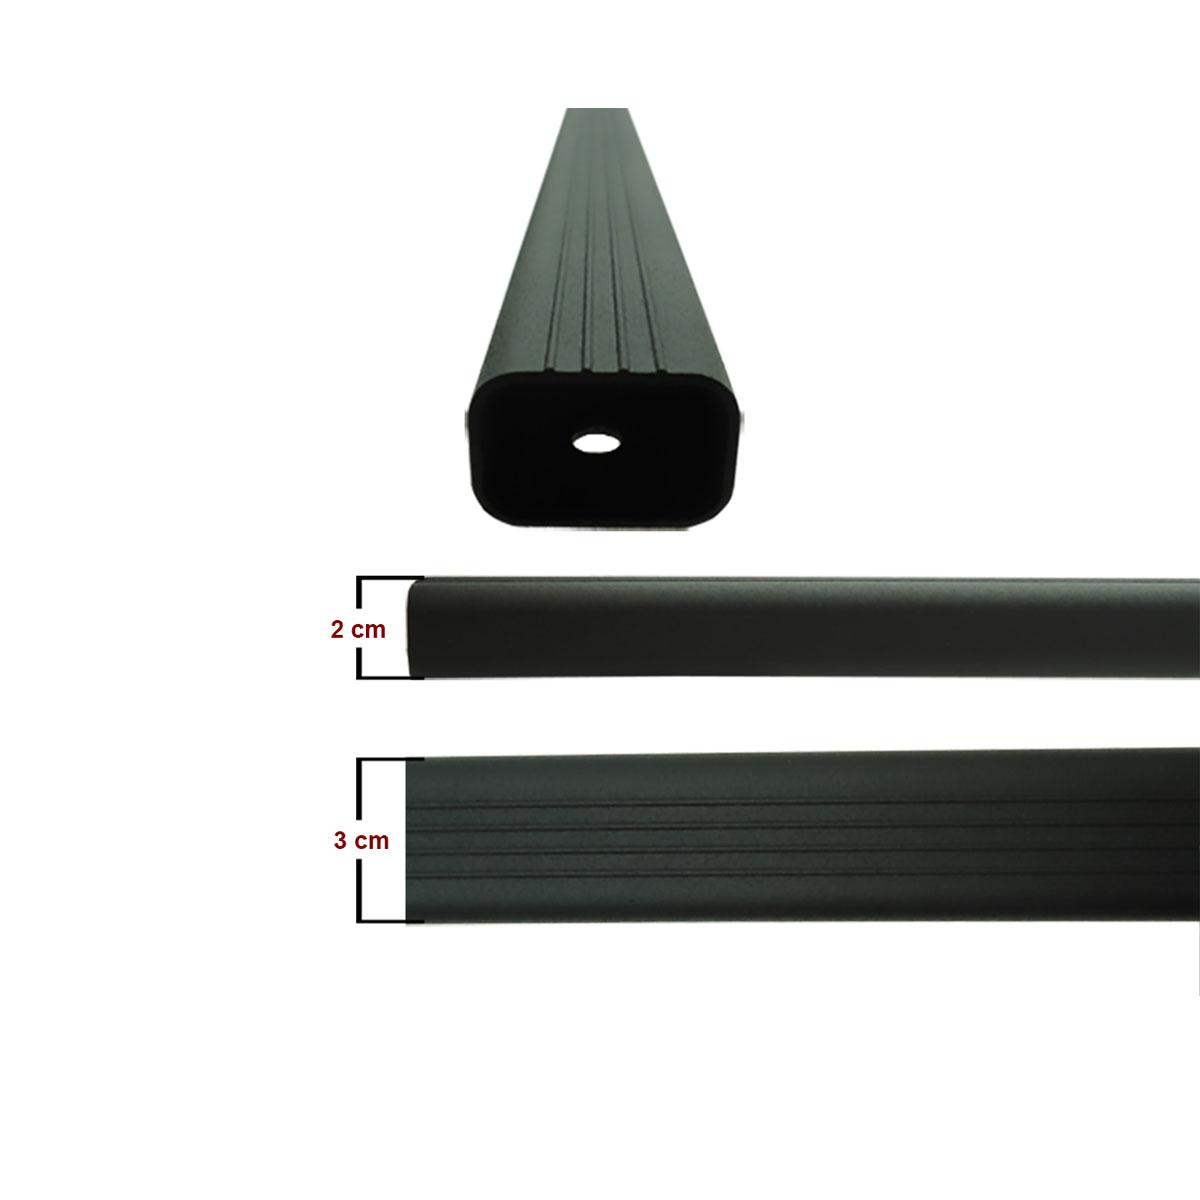 Travessa rack de teto alumínio preta Spacefox 2006 a 2017 ou Space Cross 2012 a 2017 kit 3 peças